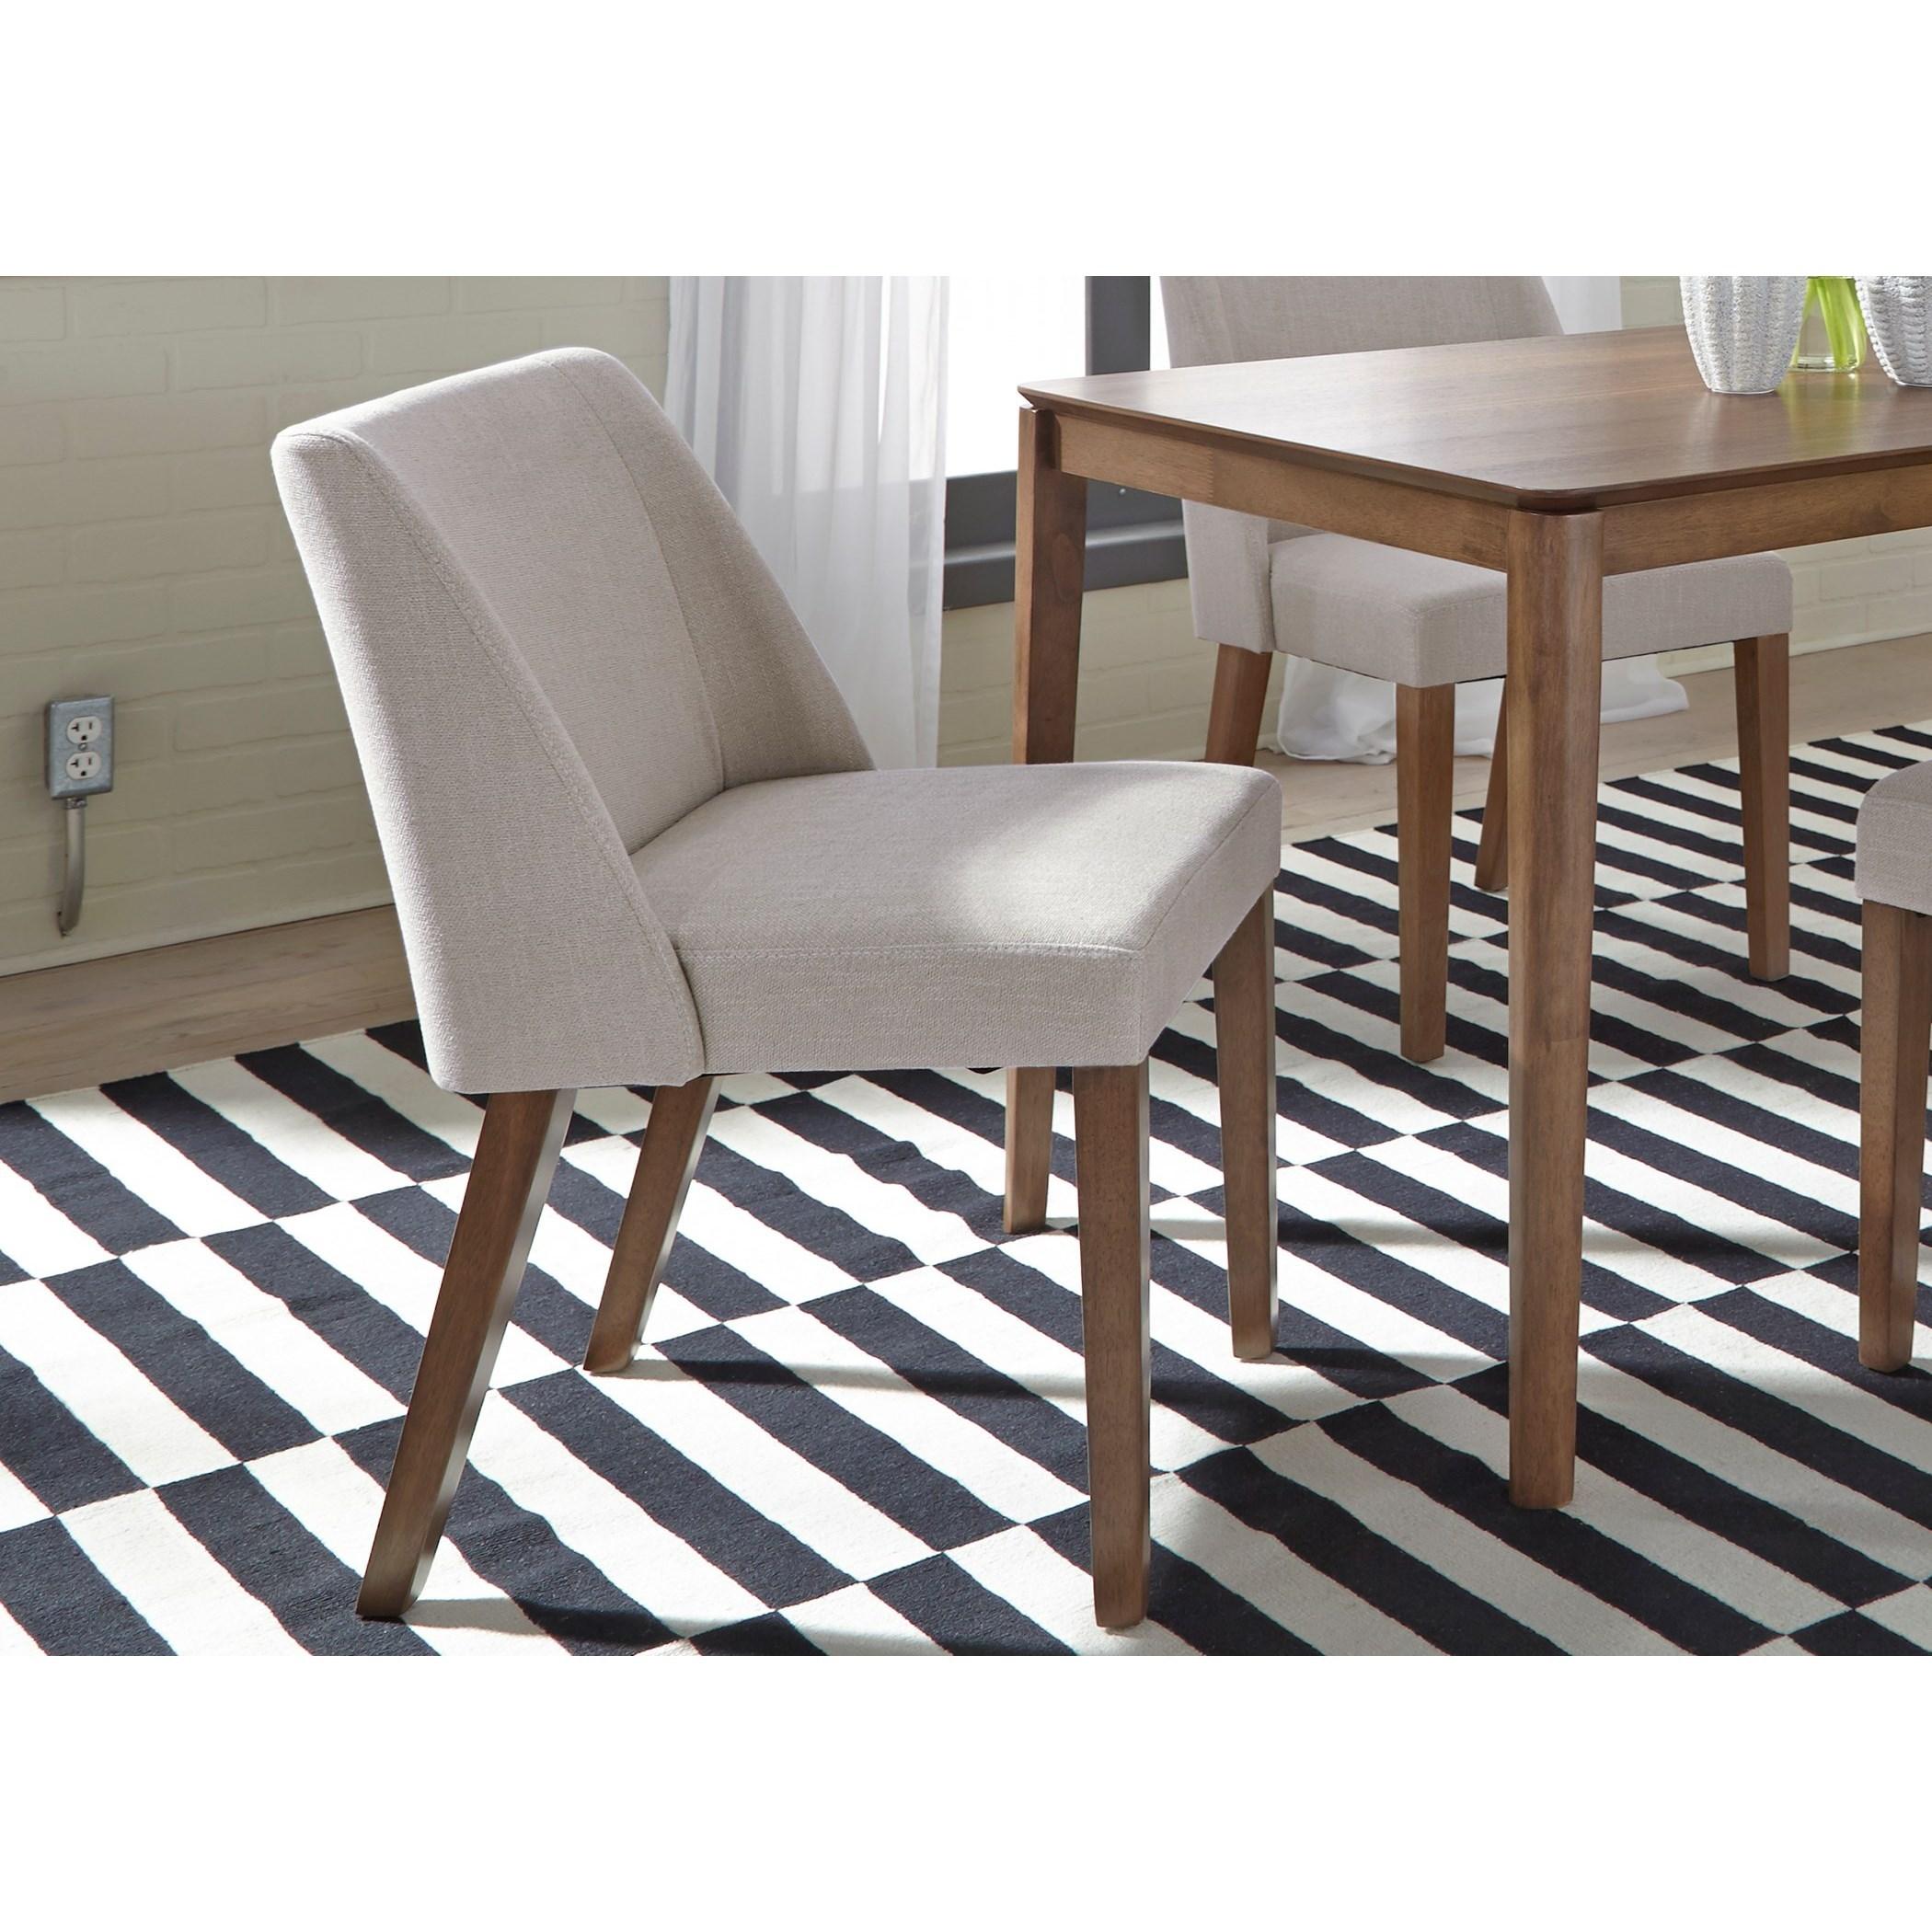 Nido Chair